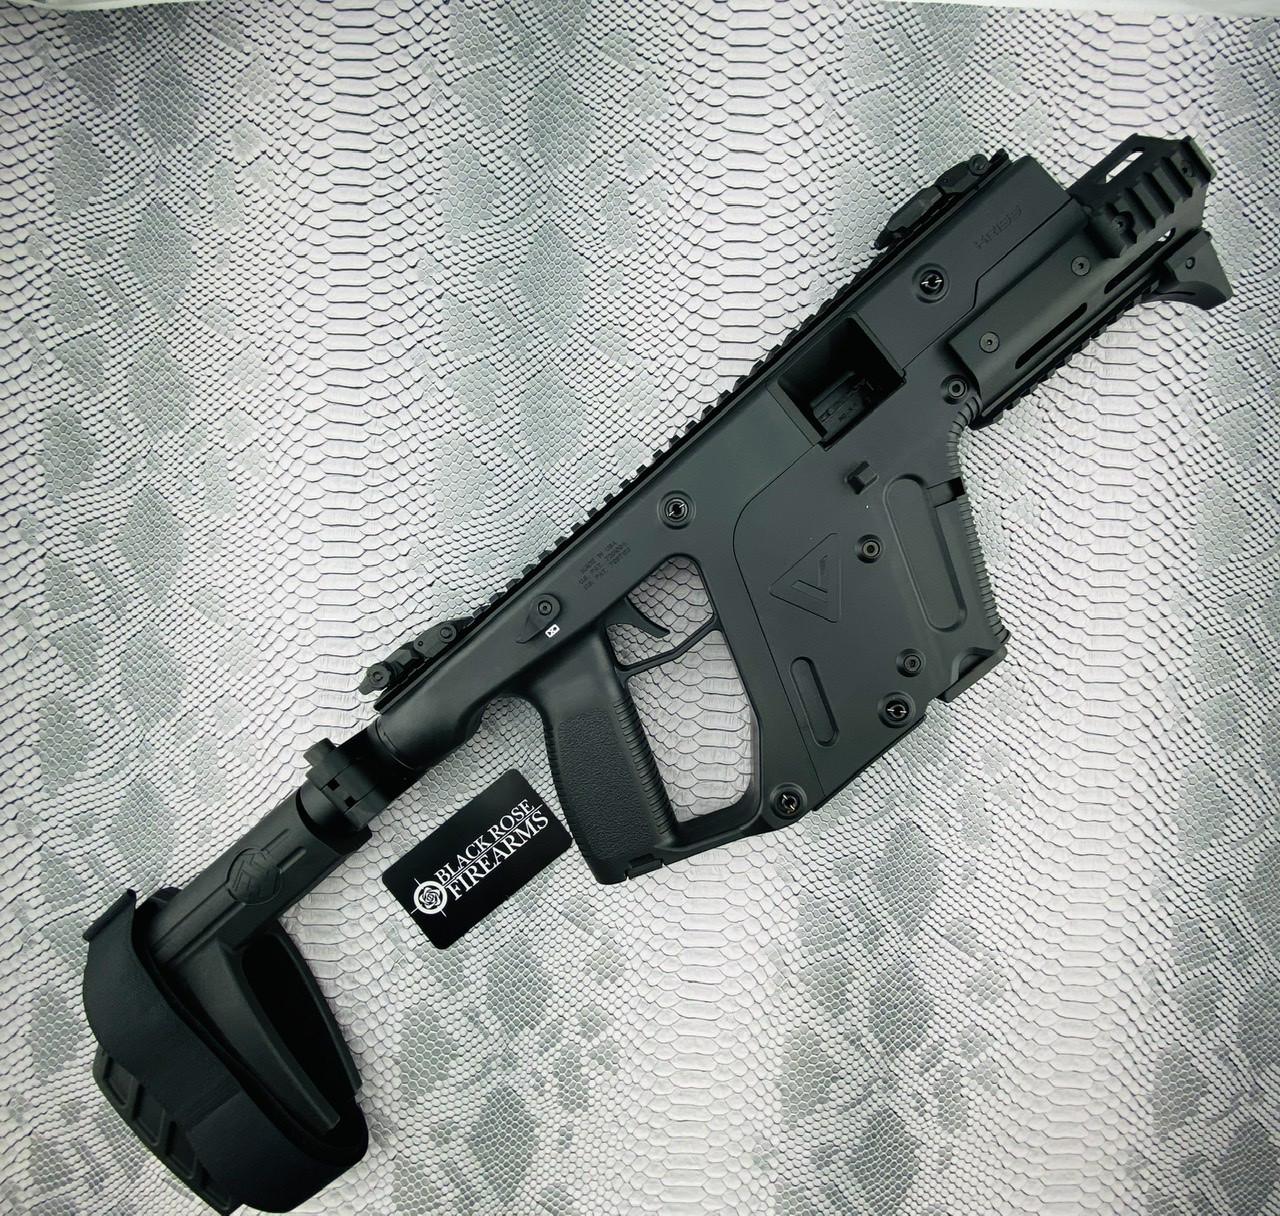 Kriss Vector SDP SB G2 9mm Threaded